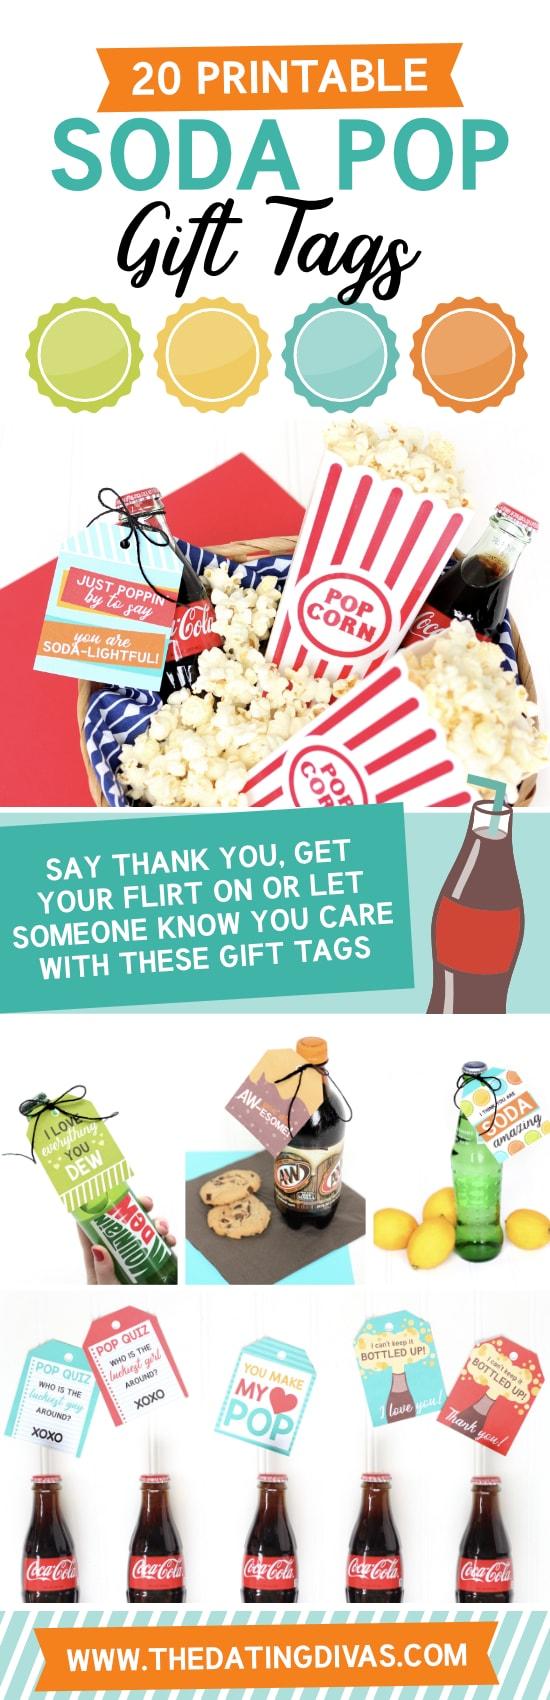 Soda Pop Gift Tags